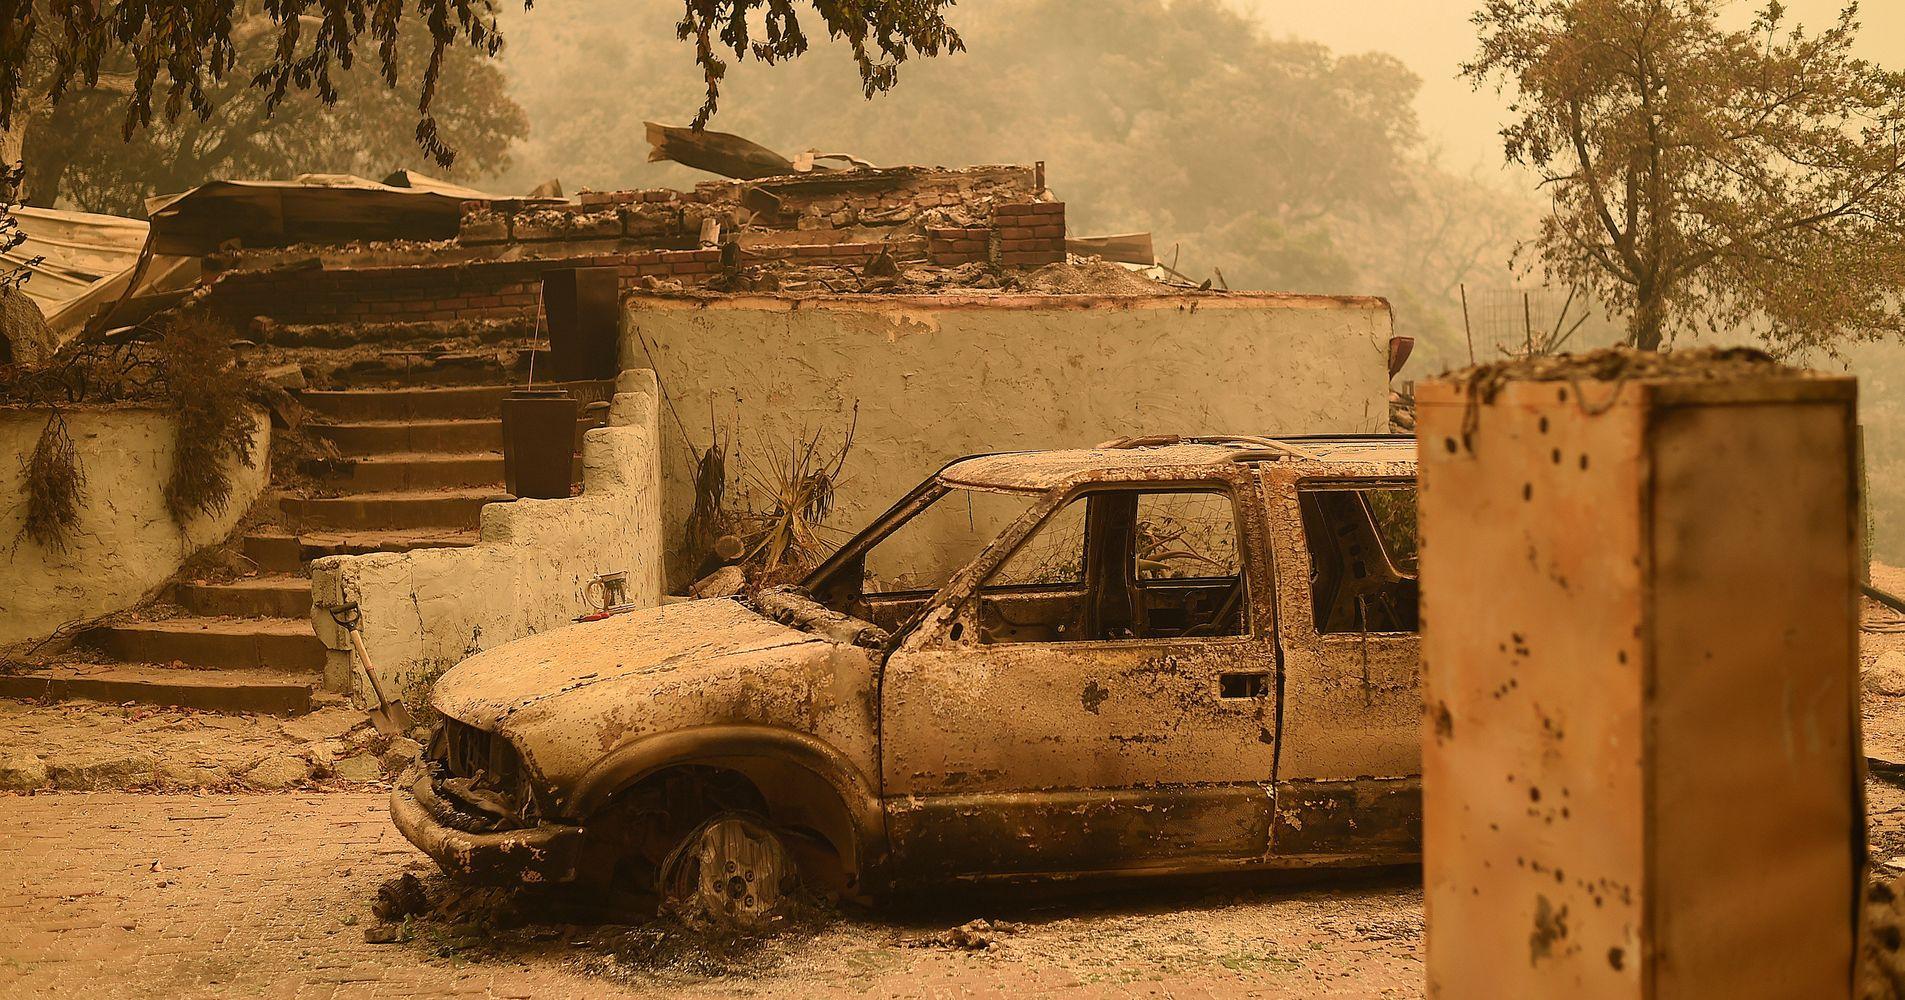 central coast fires - photo #31